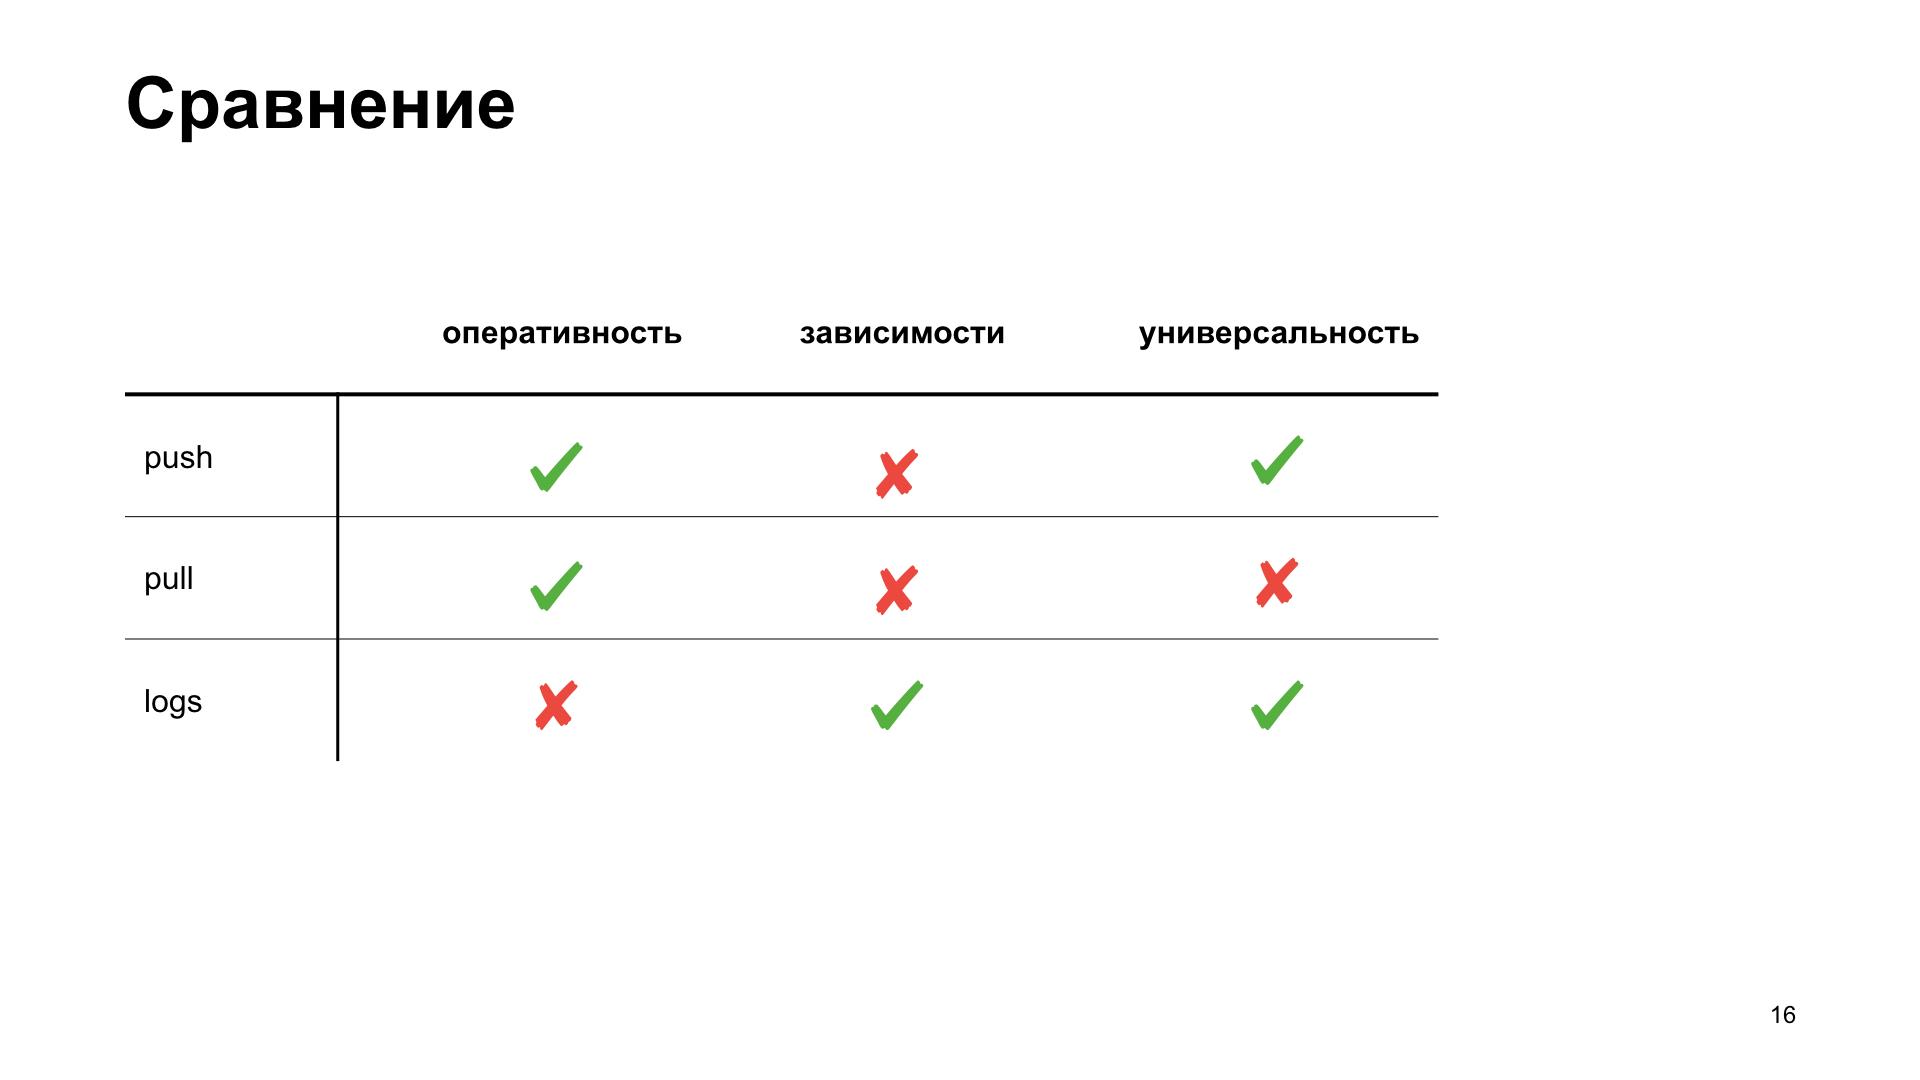 uWSGI в помощь метрикам. Доклад Яндекса - 10